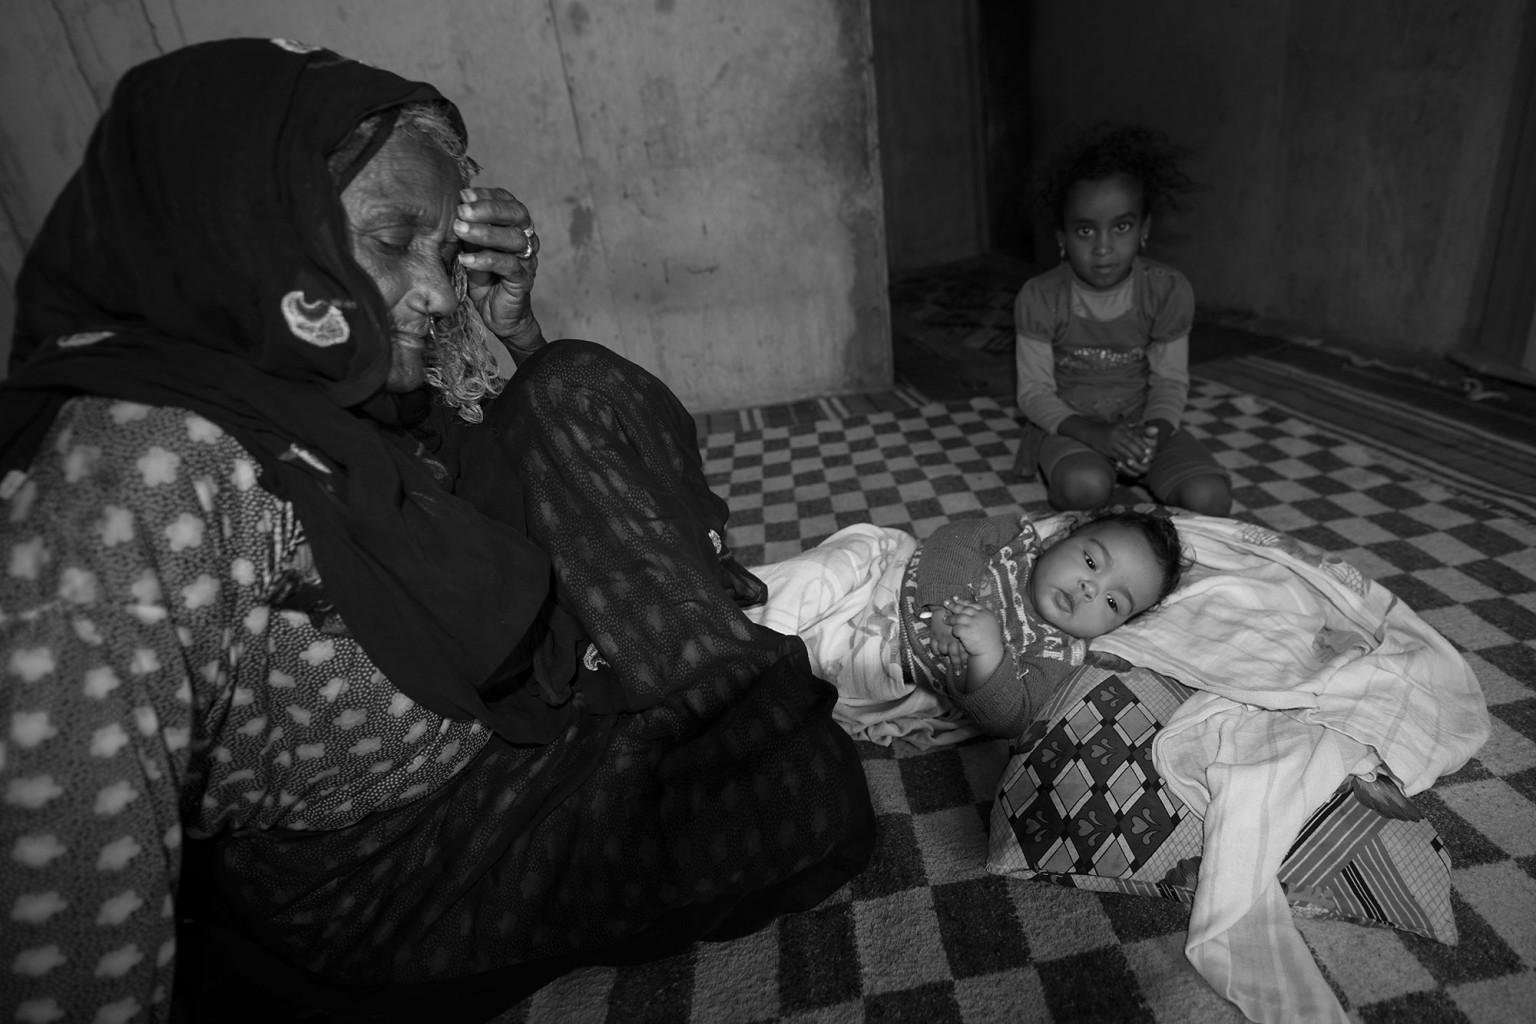 Beduin Family at Ras Abu Ghusun, Red Sea - Egypt